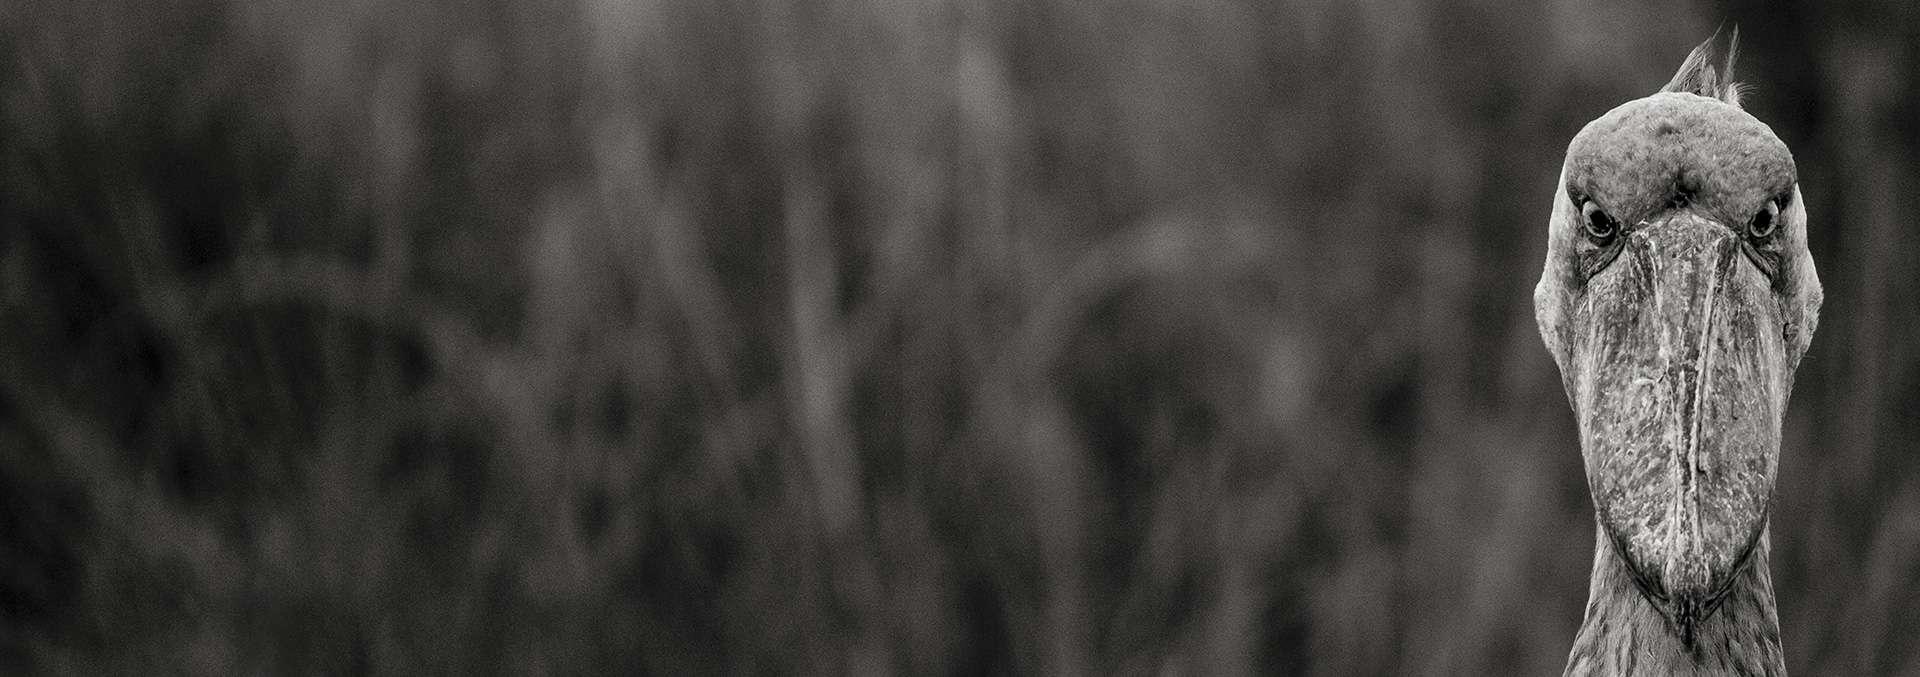 Photographie de Gilles Martin : bec-en-sabot d'Ouganda, Struggle for life